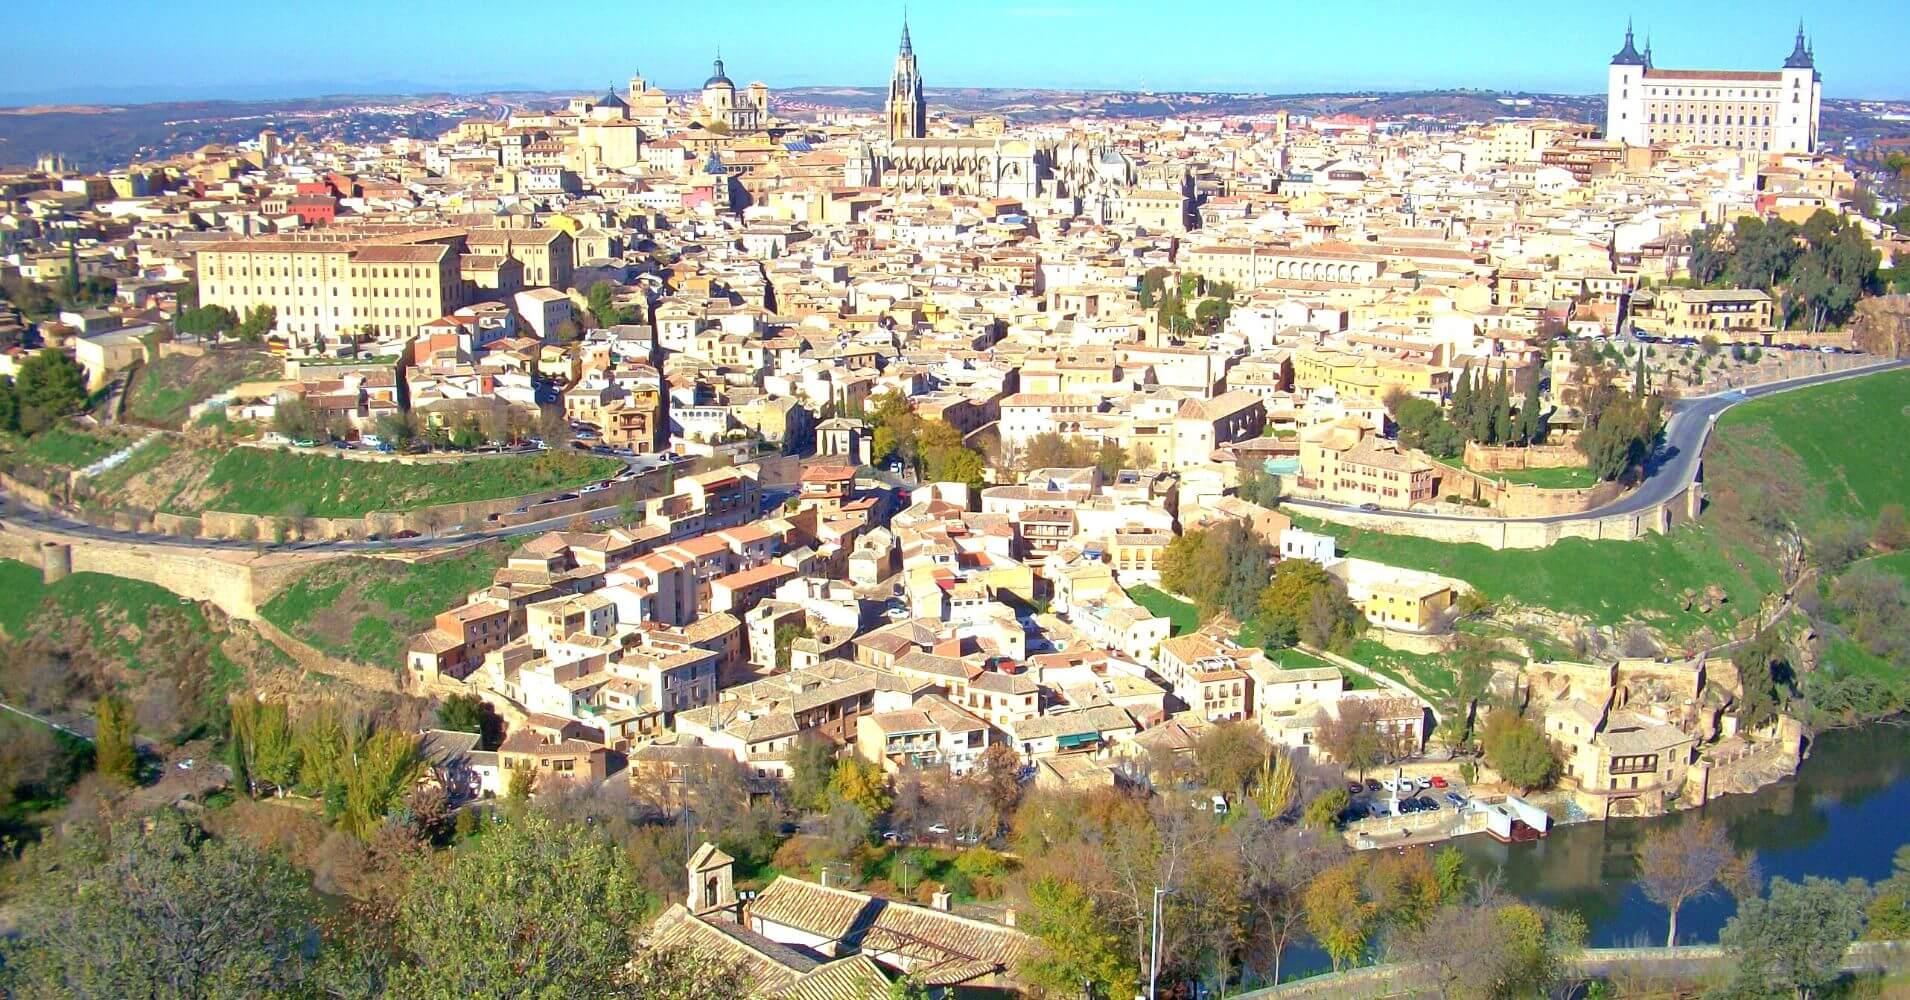 Vista panorámica de la Ciudad de toledo. Castilla la Mancha.